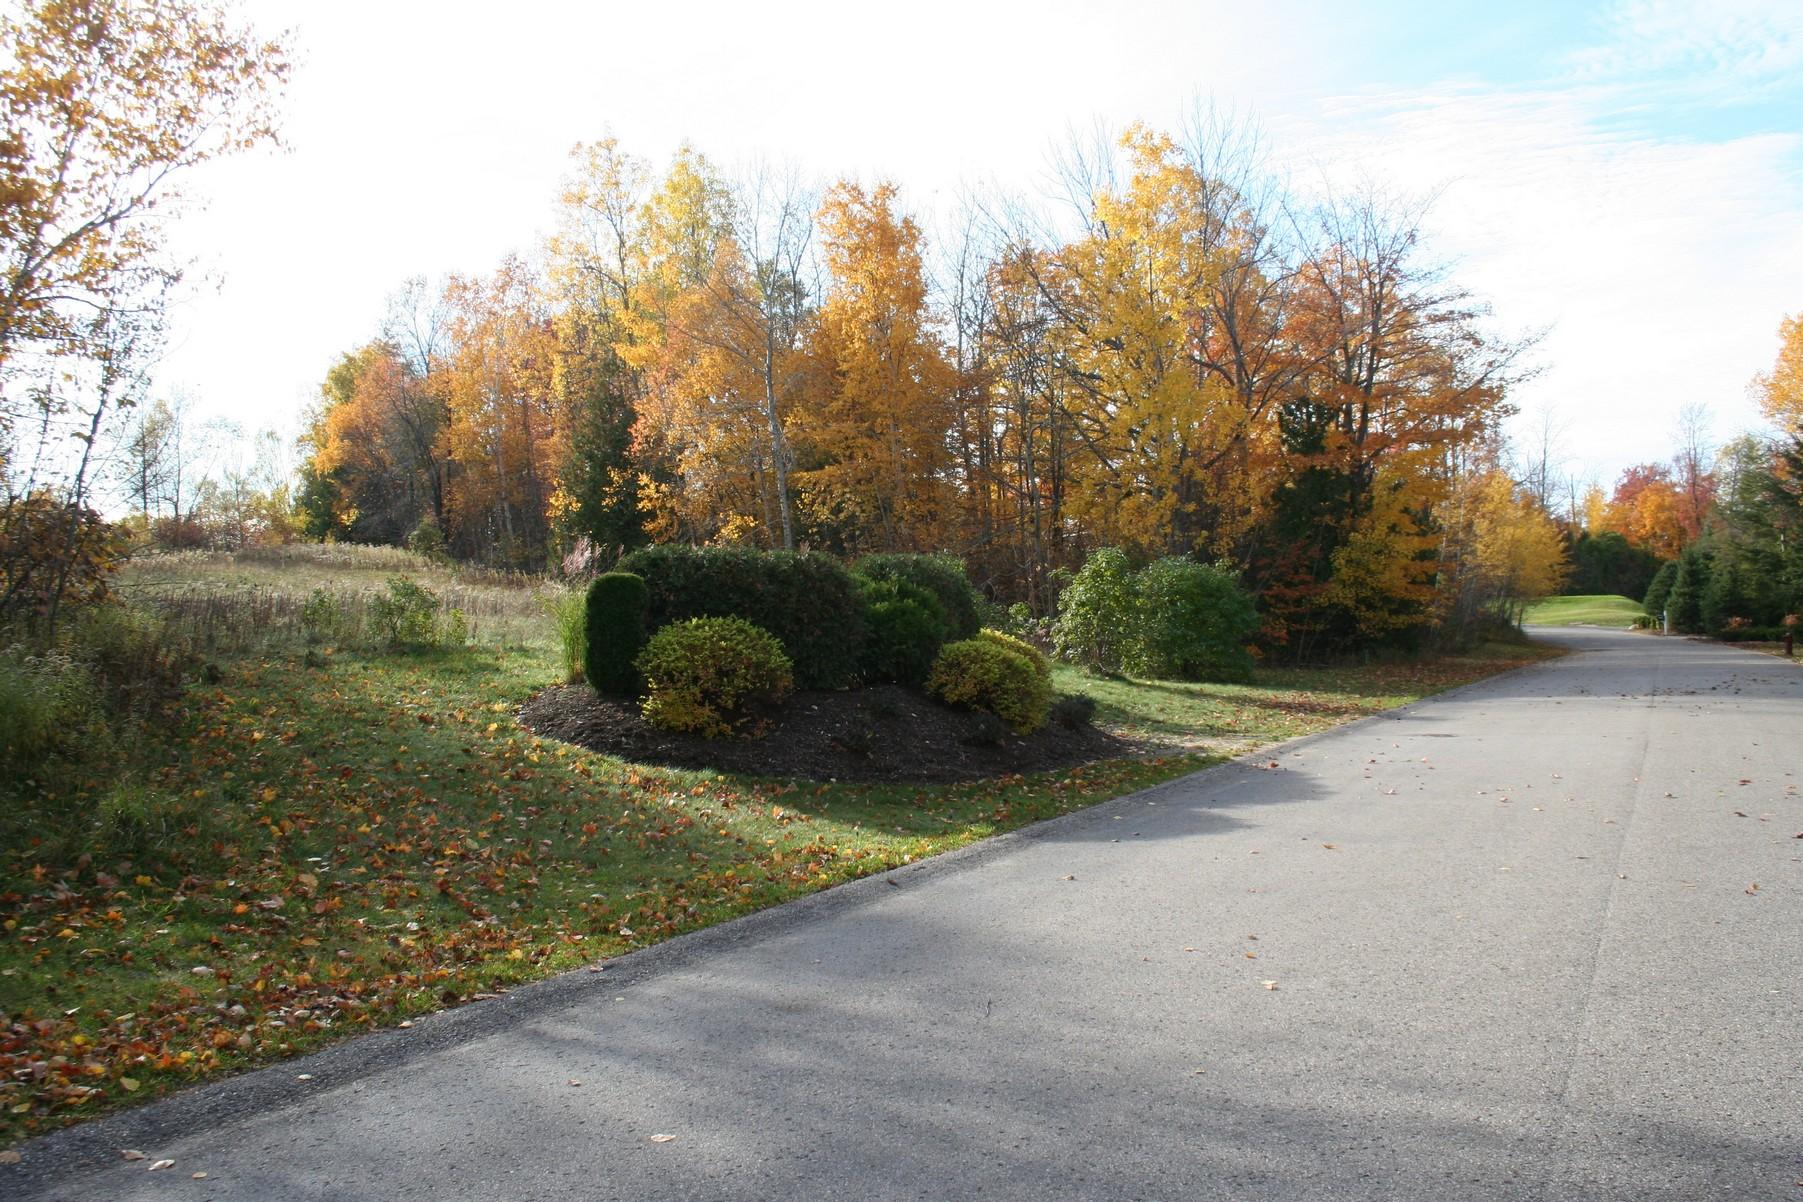 Land for Sale at Coastal Cliffs 19 6053 Coastal Cliffs Bay Harbor, Michigan, 49770 United States